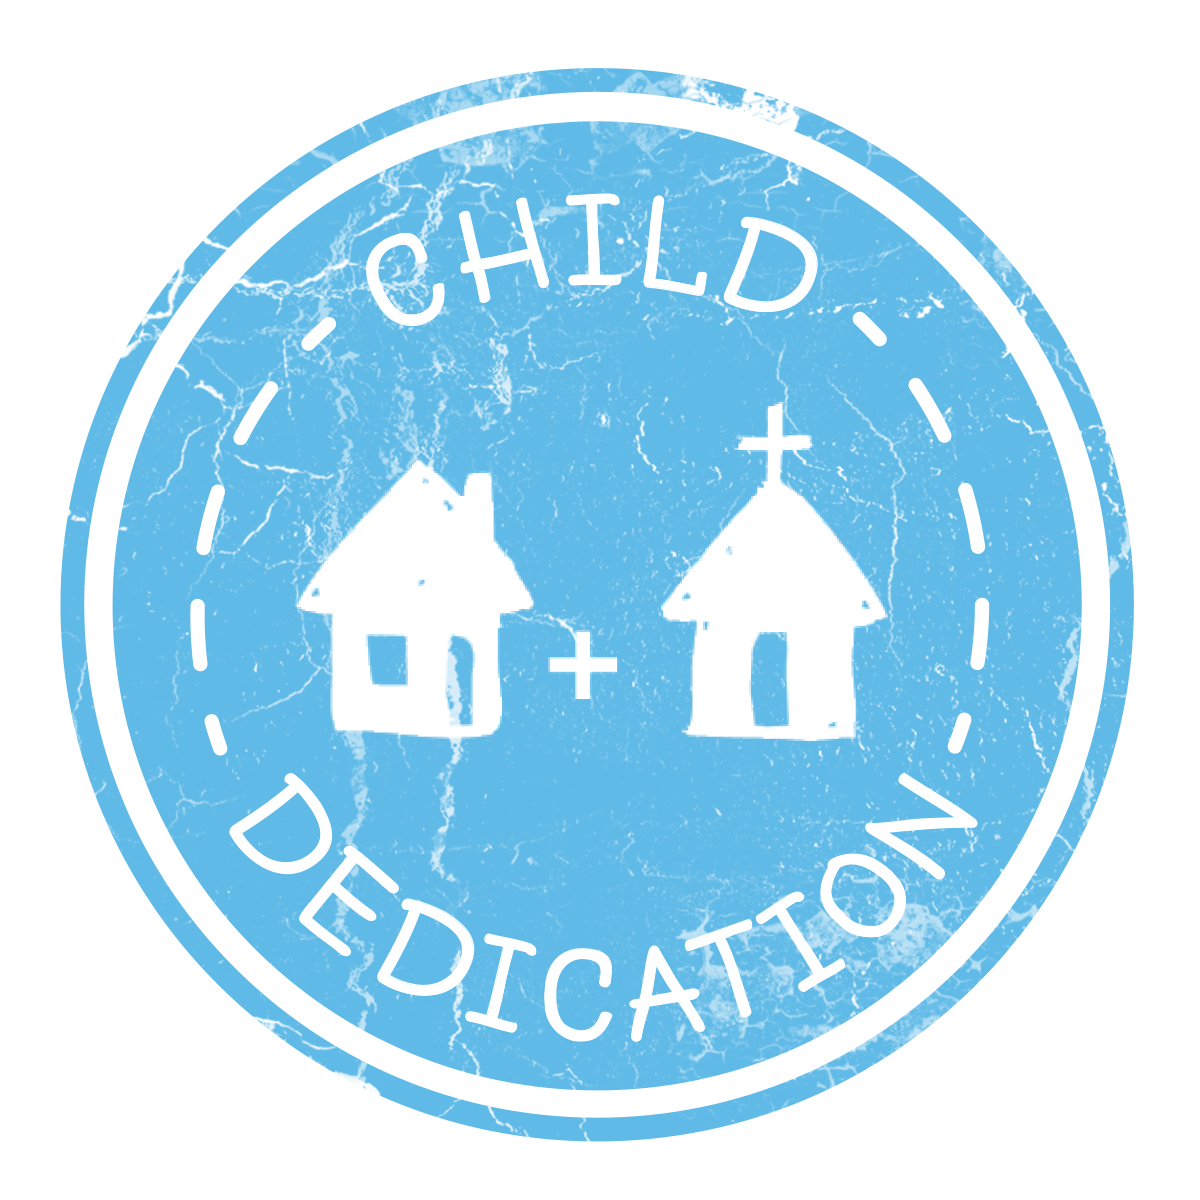 child dedication 05 2013.jpg